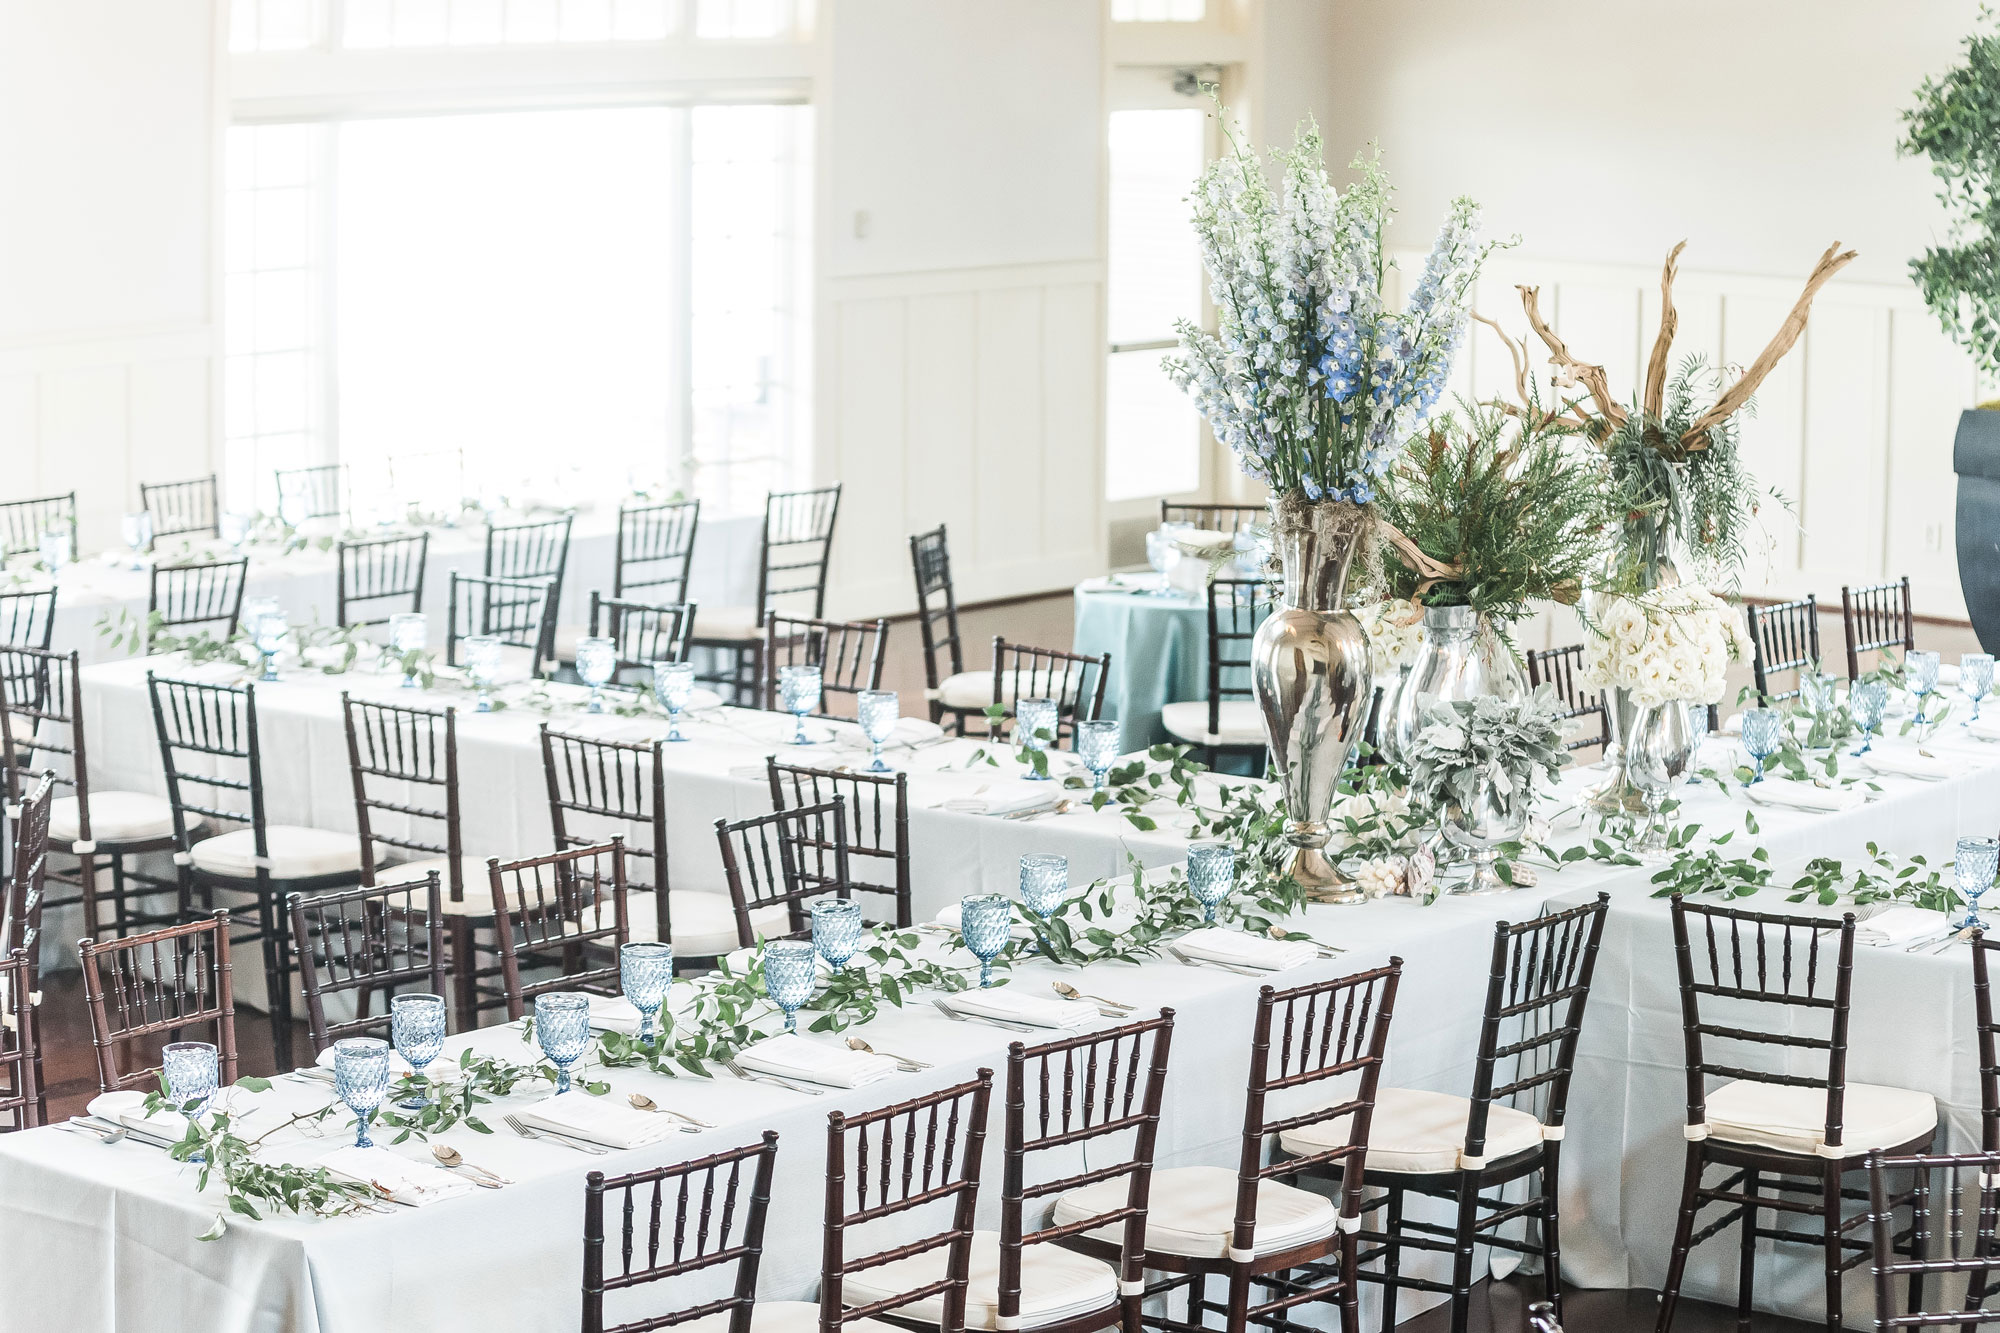 Chesapeake-Bay-Beach-Club-Fine-Art-Wedding-Maryland-Manda-Weaver-Eastern-Shore-Photo-6